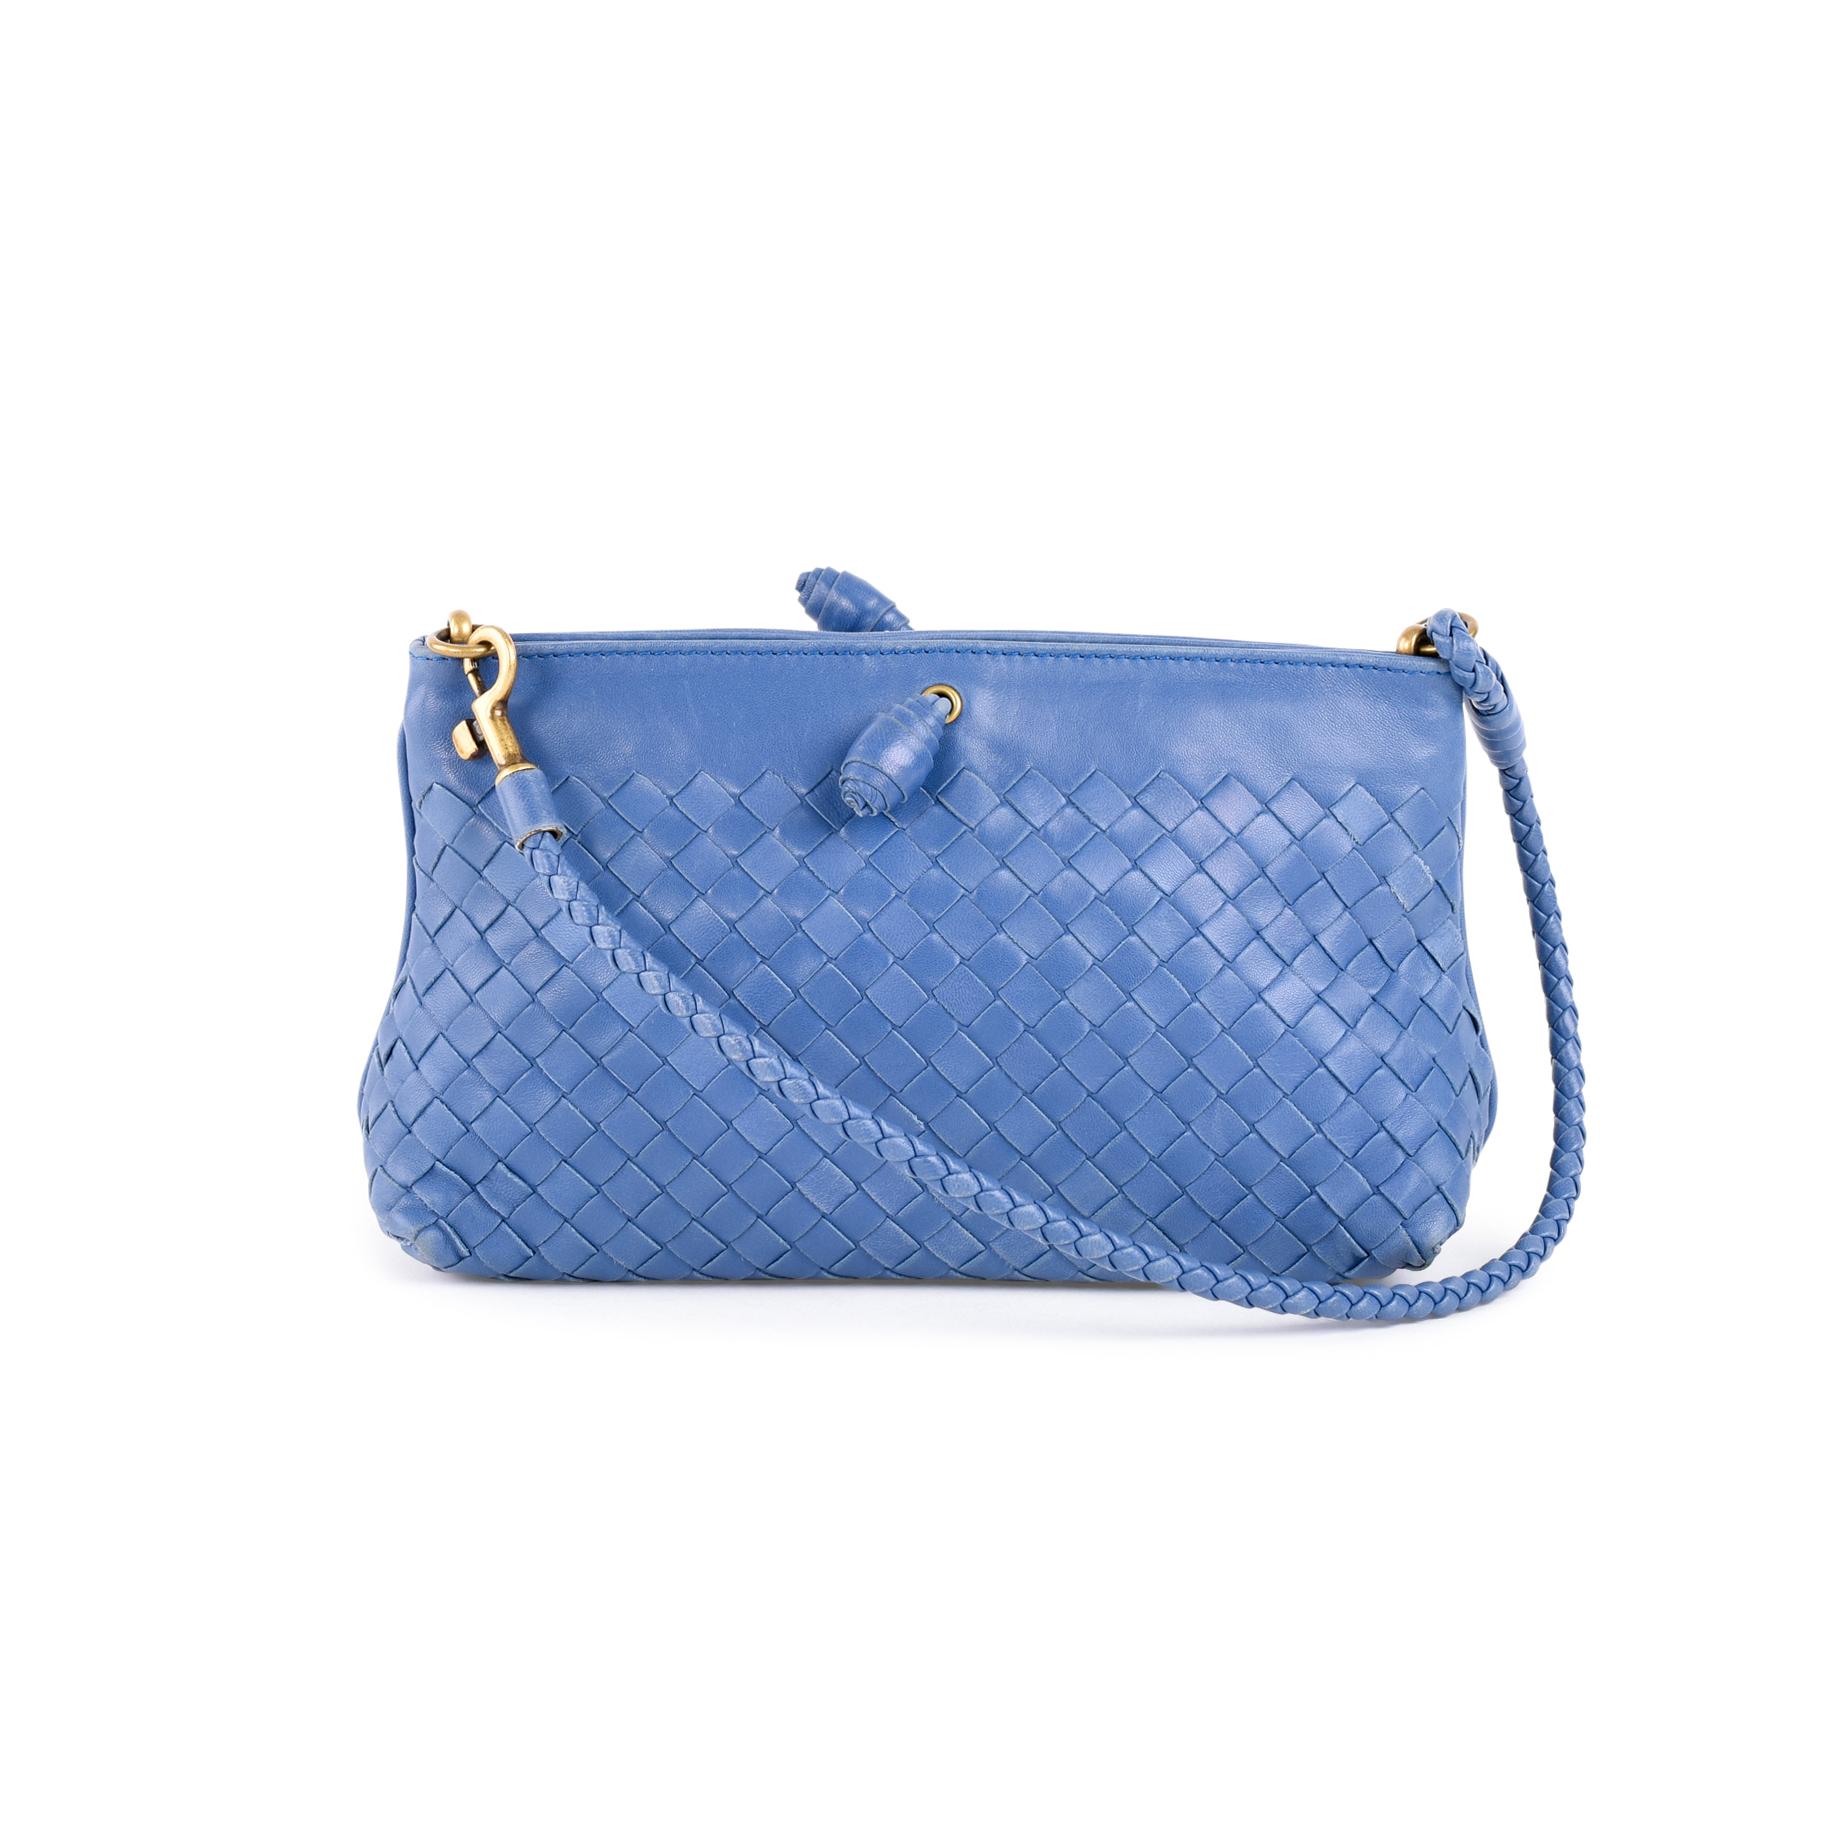 43e2d44f33 Authentic Second Hand Bottega Veneta Intrecciato Small Leather Shoulder Bag  (PSS-462-00032)